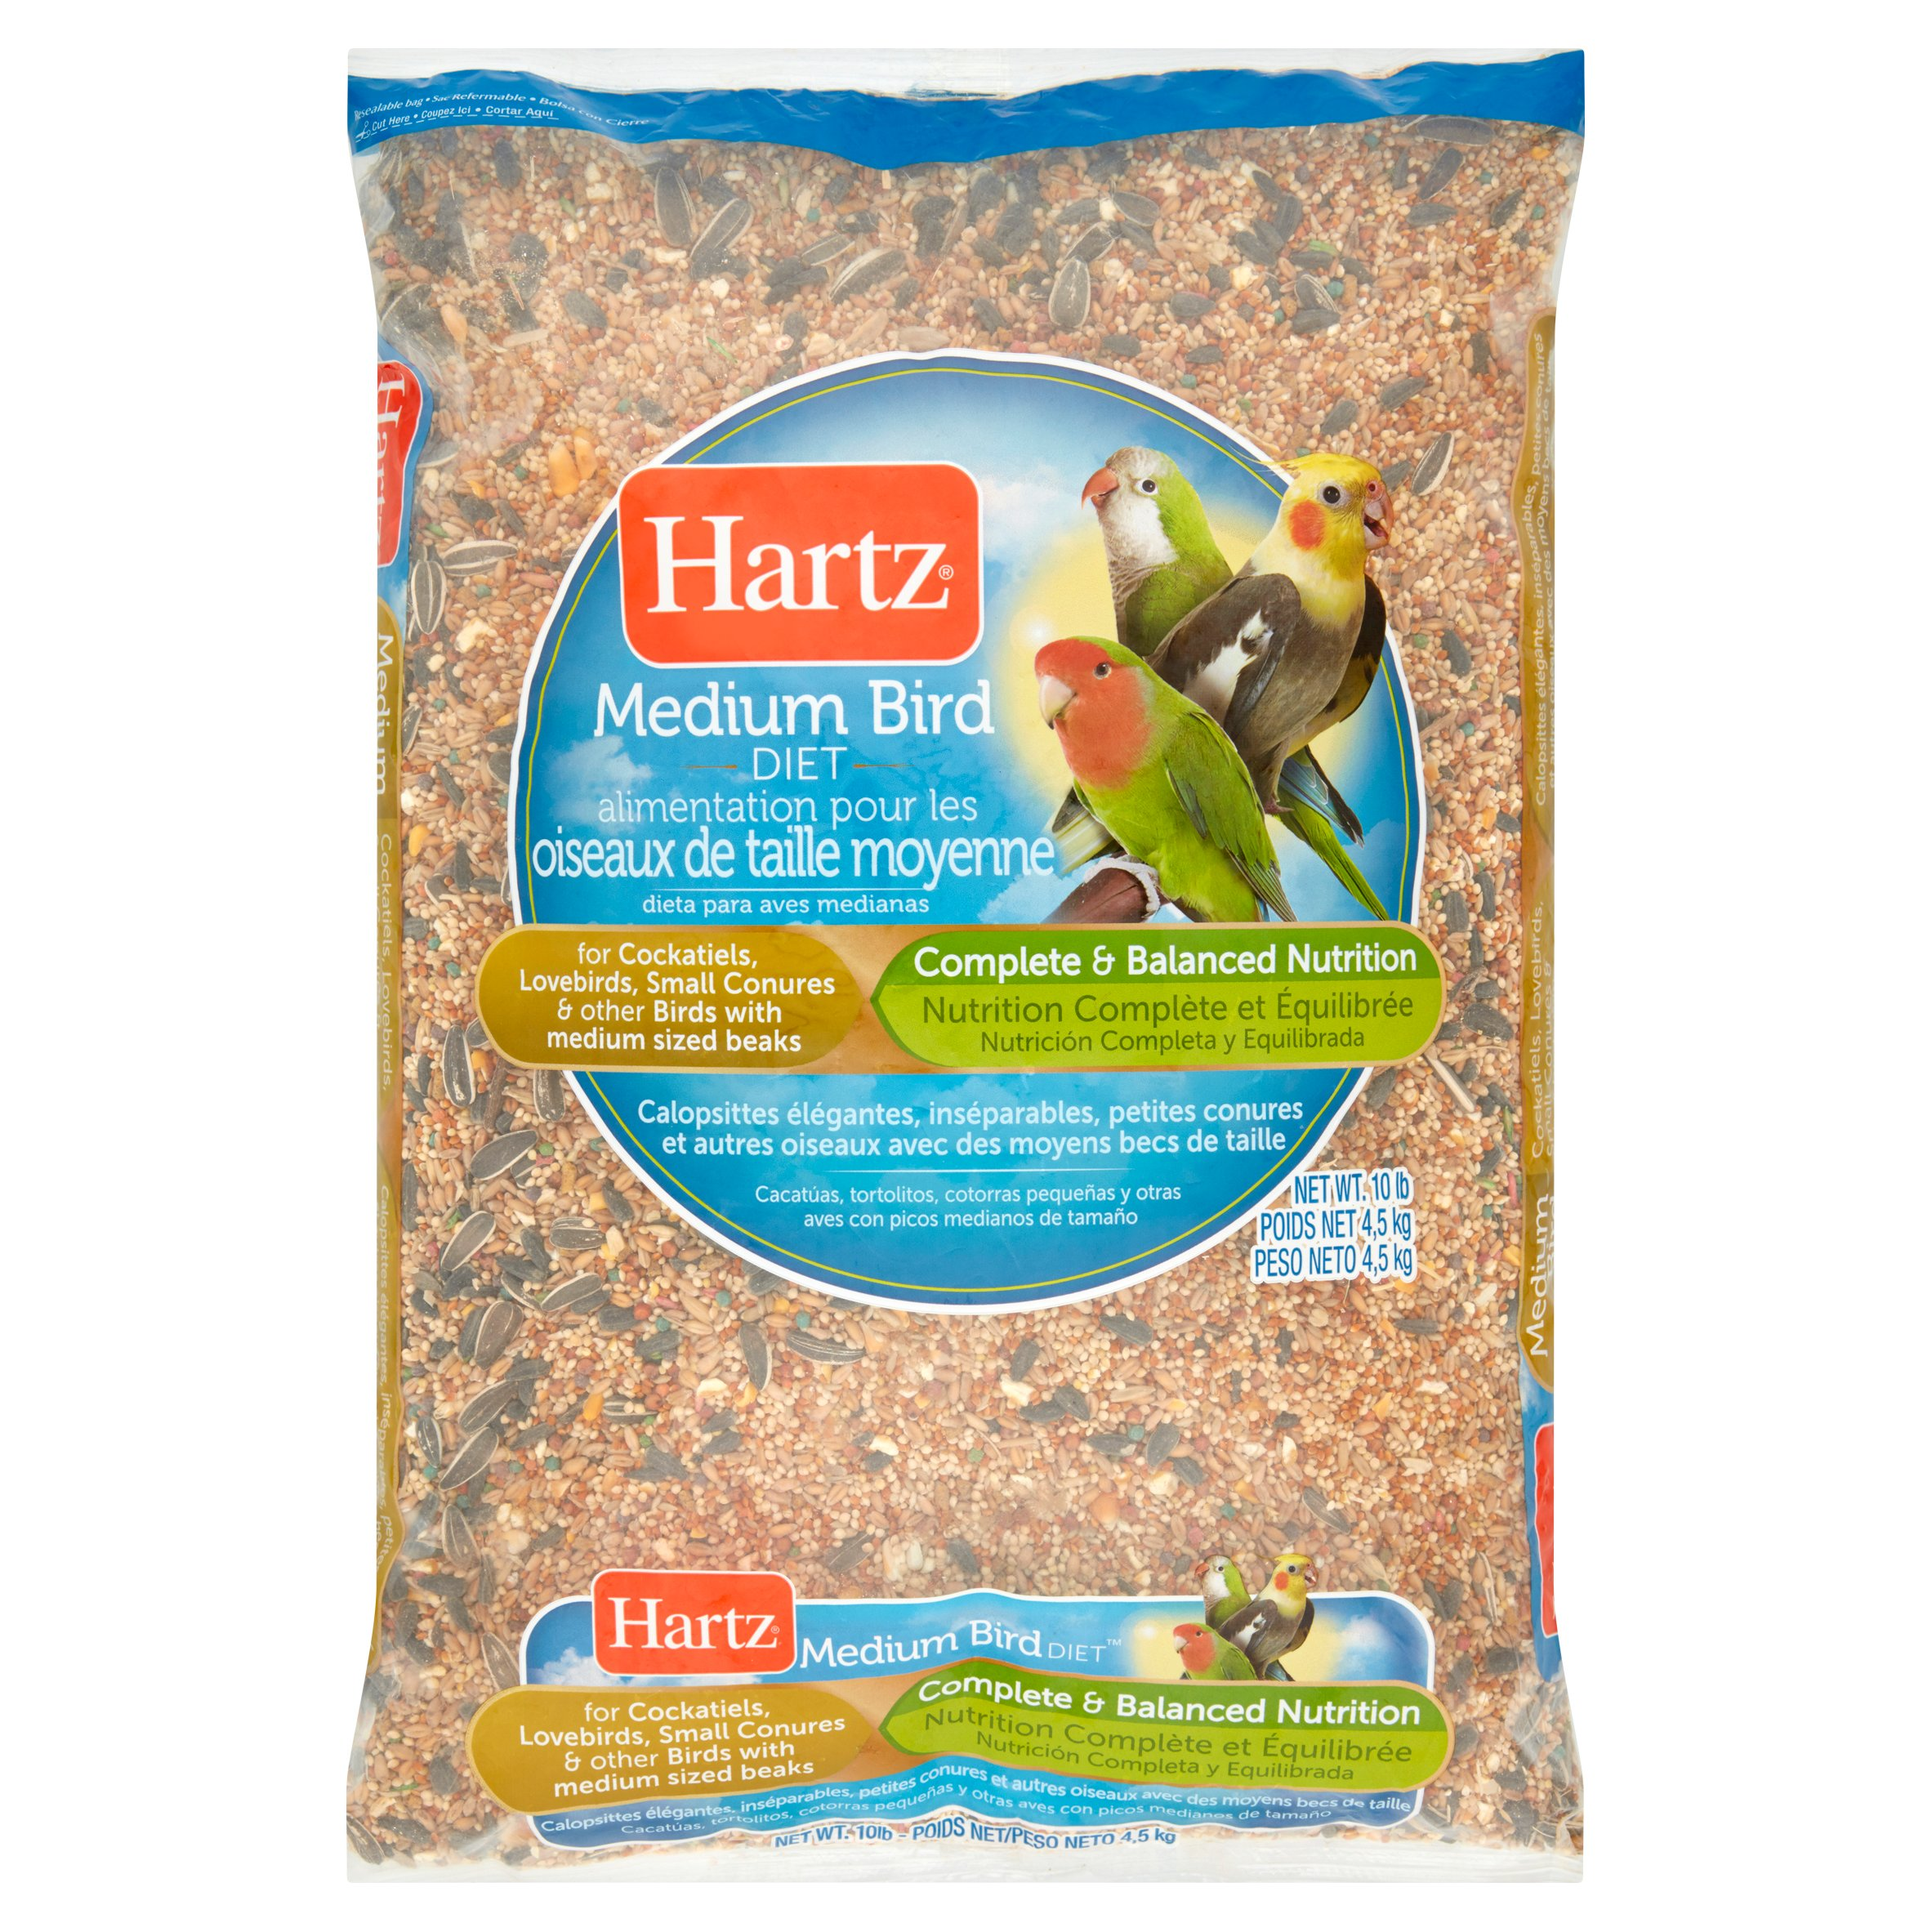 Hartz Cockatiel Medium Bird Food, 10 lbs by The Hartz Mountain Corporation